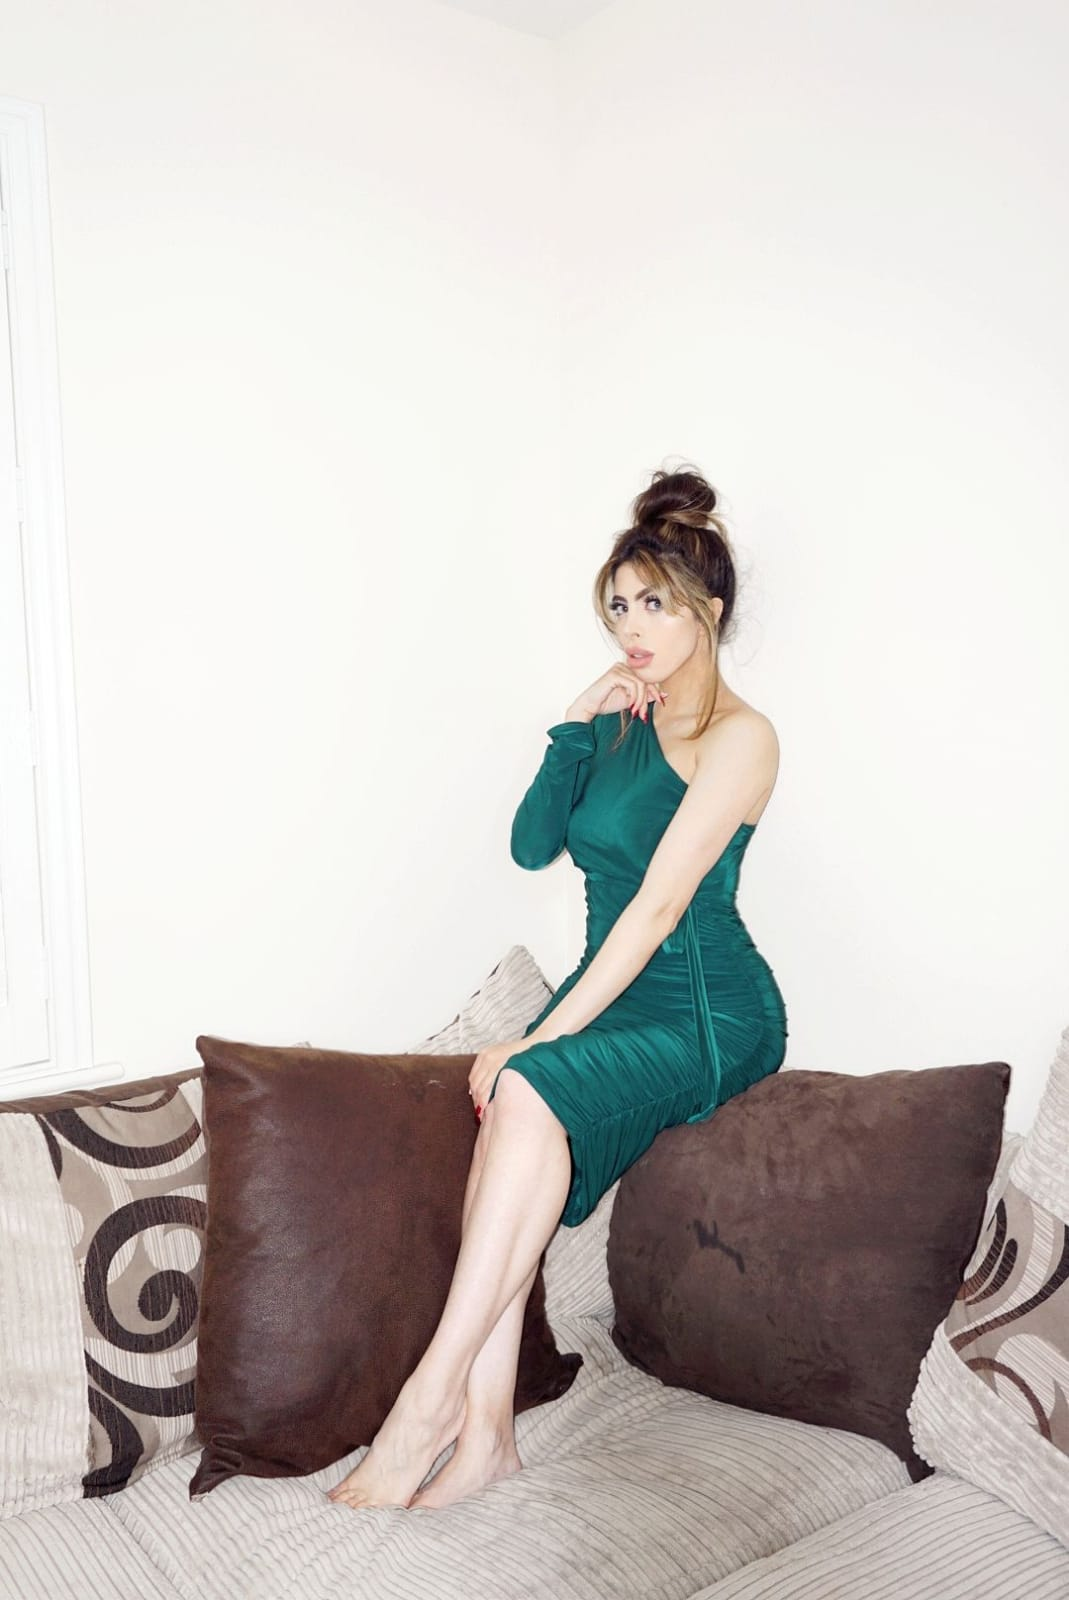 Femme Luxe Emerald One Shoulder Ruched Slinky Midi Dress in model Savannah